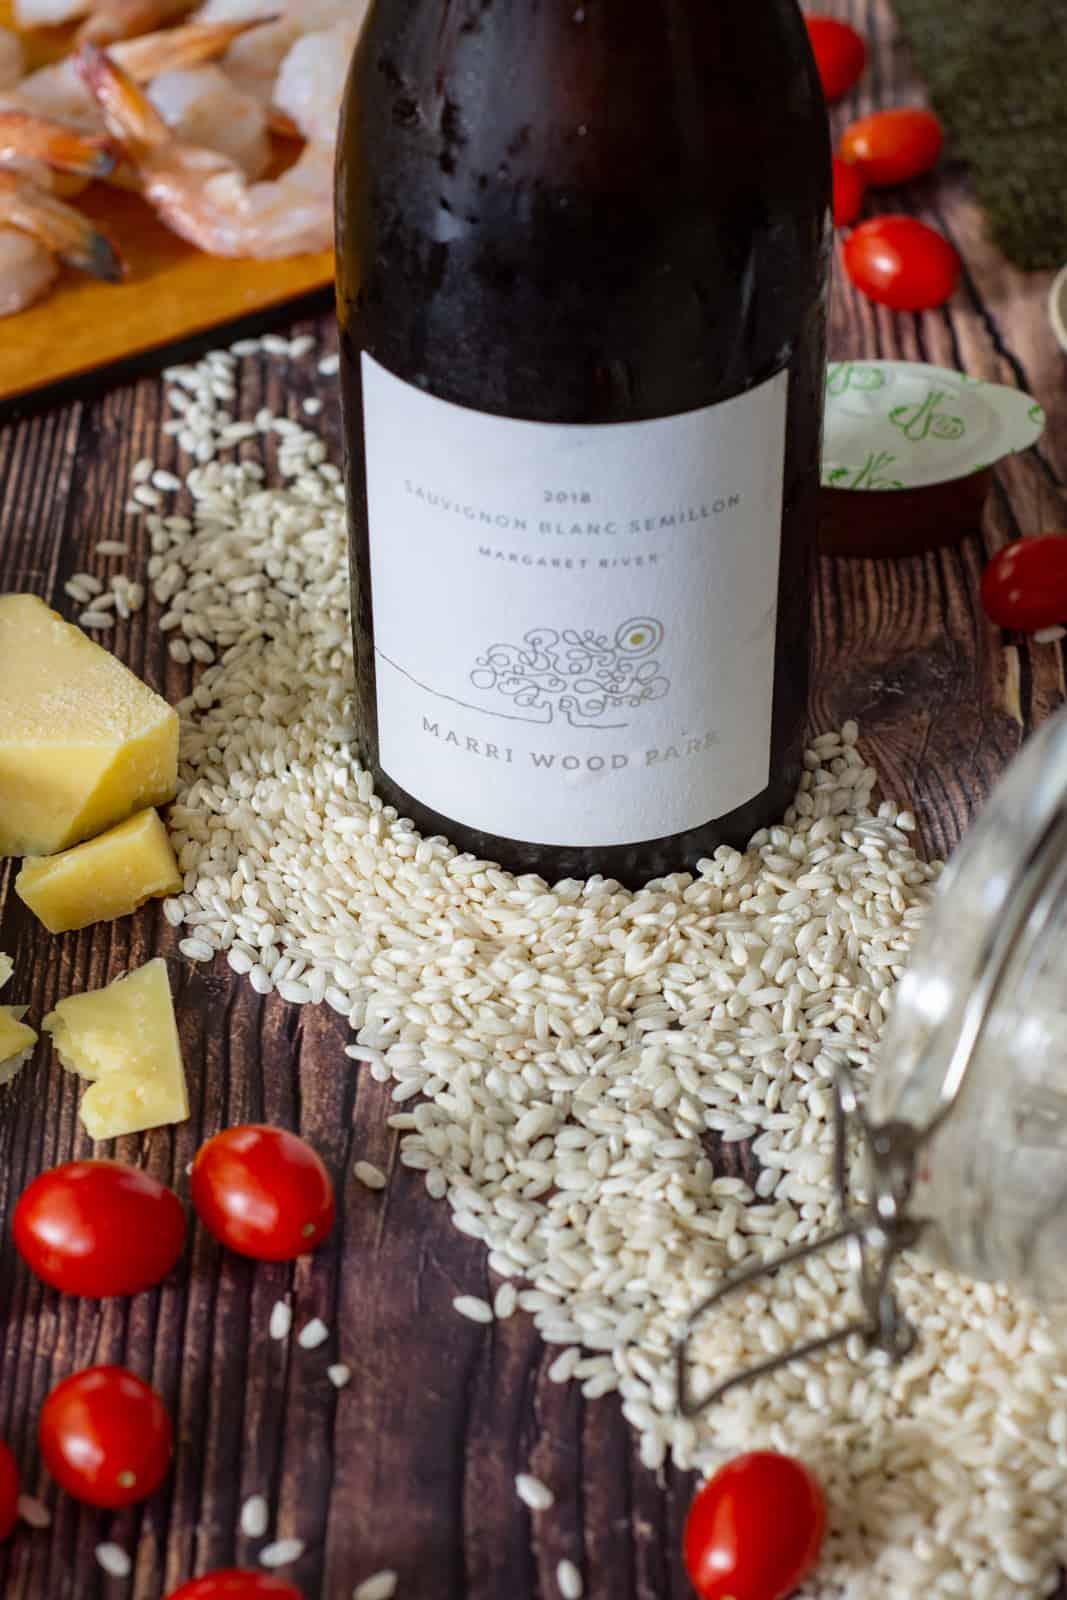 marri wood park sauvignon/semillon wine, arborio rice, tomatoes and parmesan on a wooden table